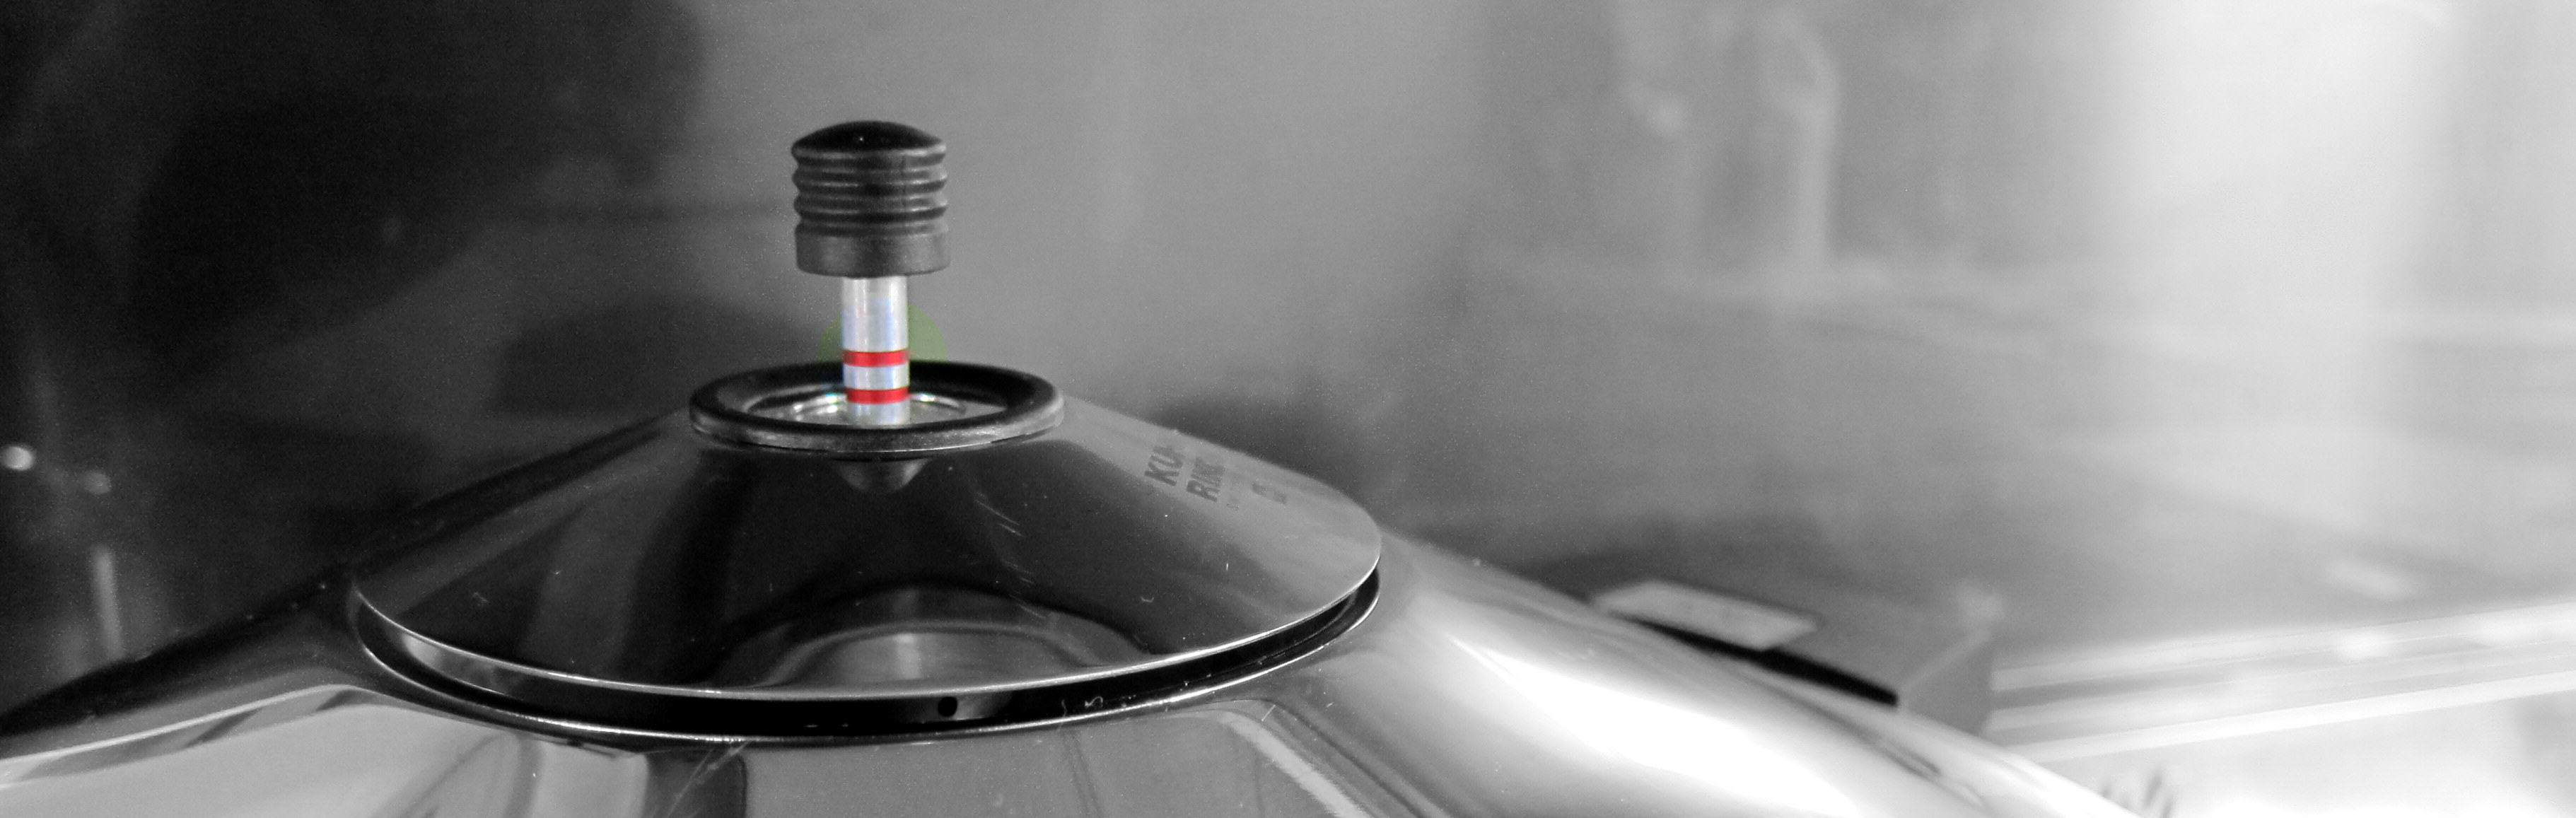 kuhn rikon duromatic pressure cooker